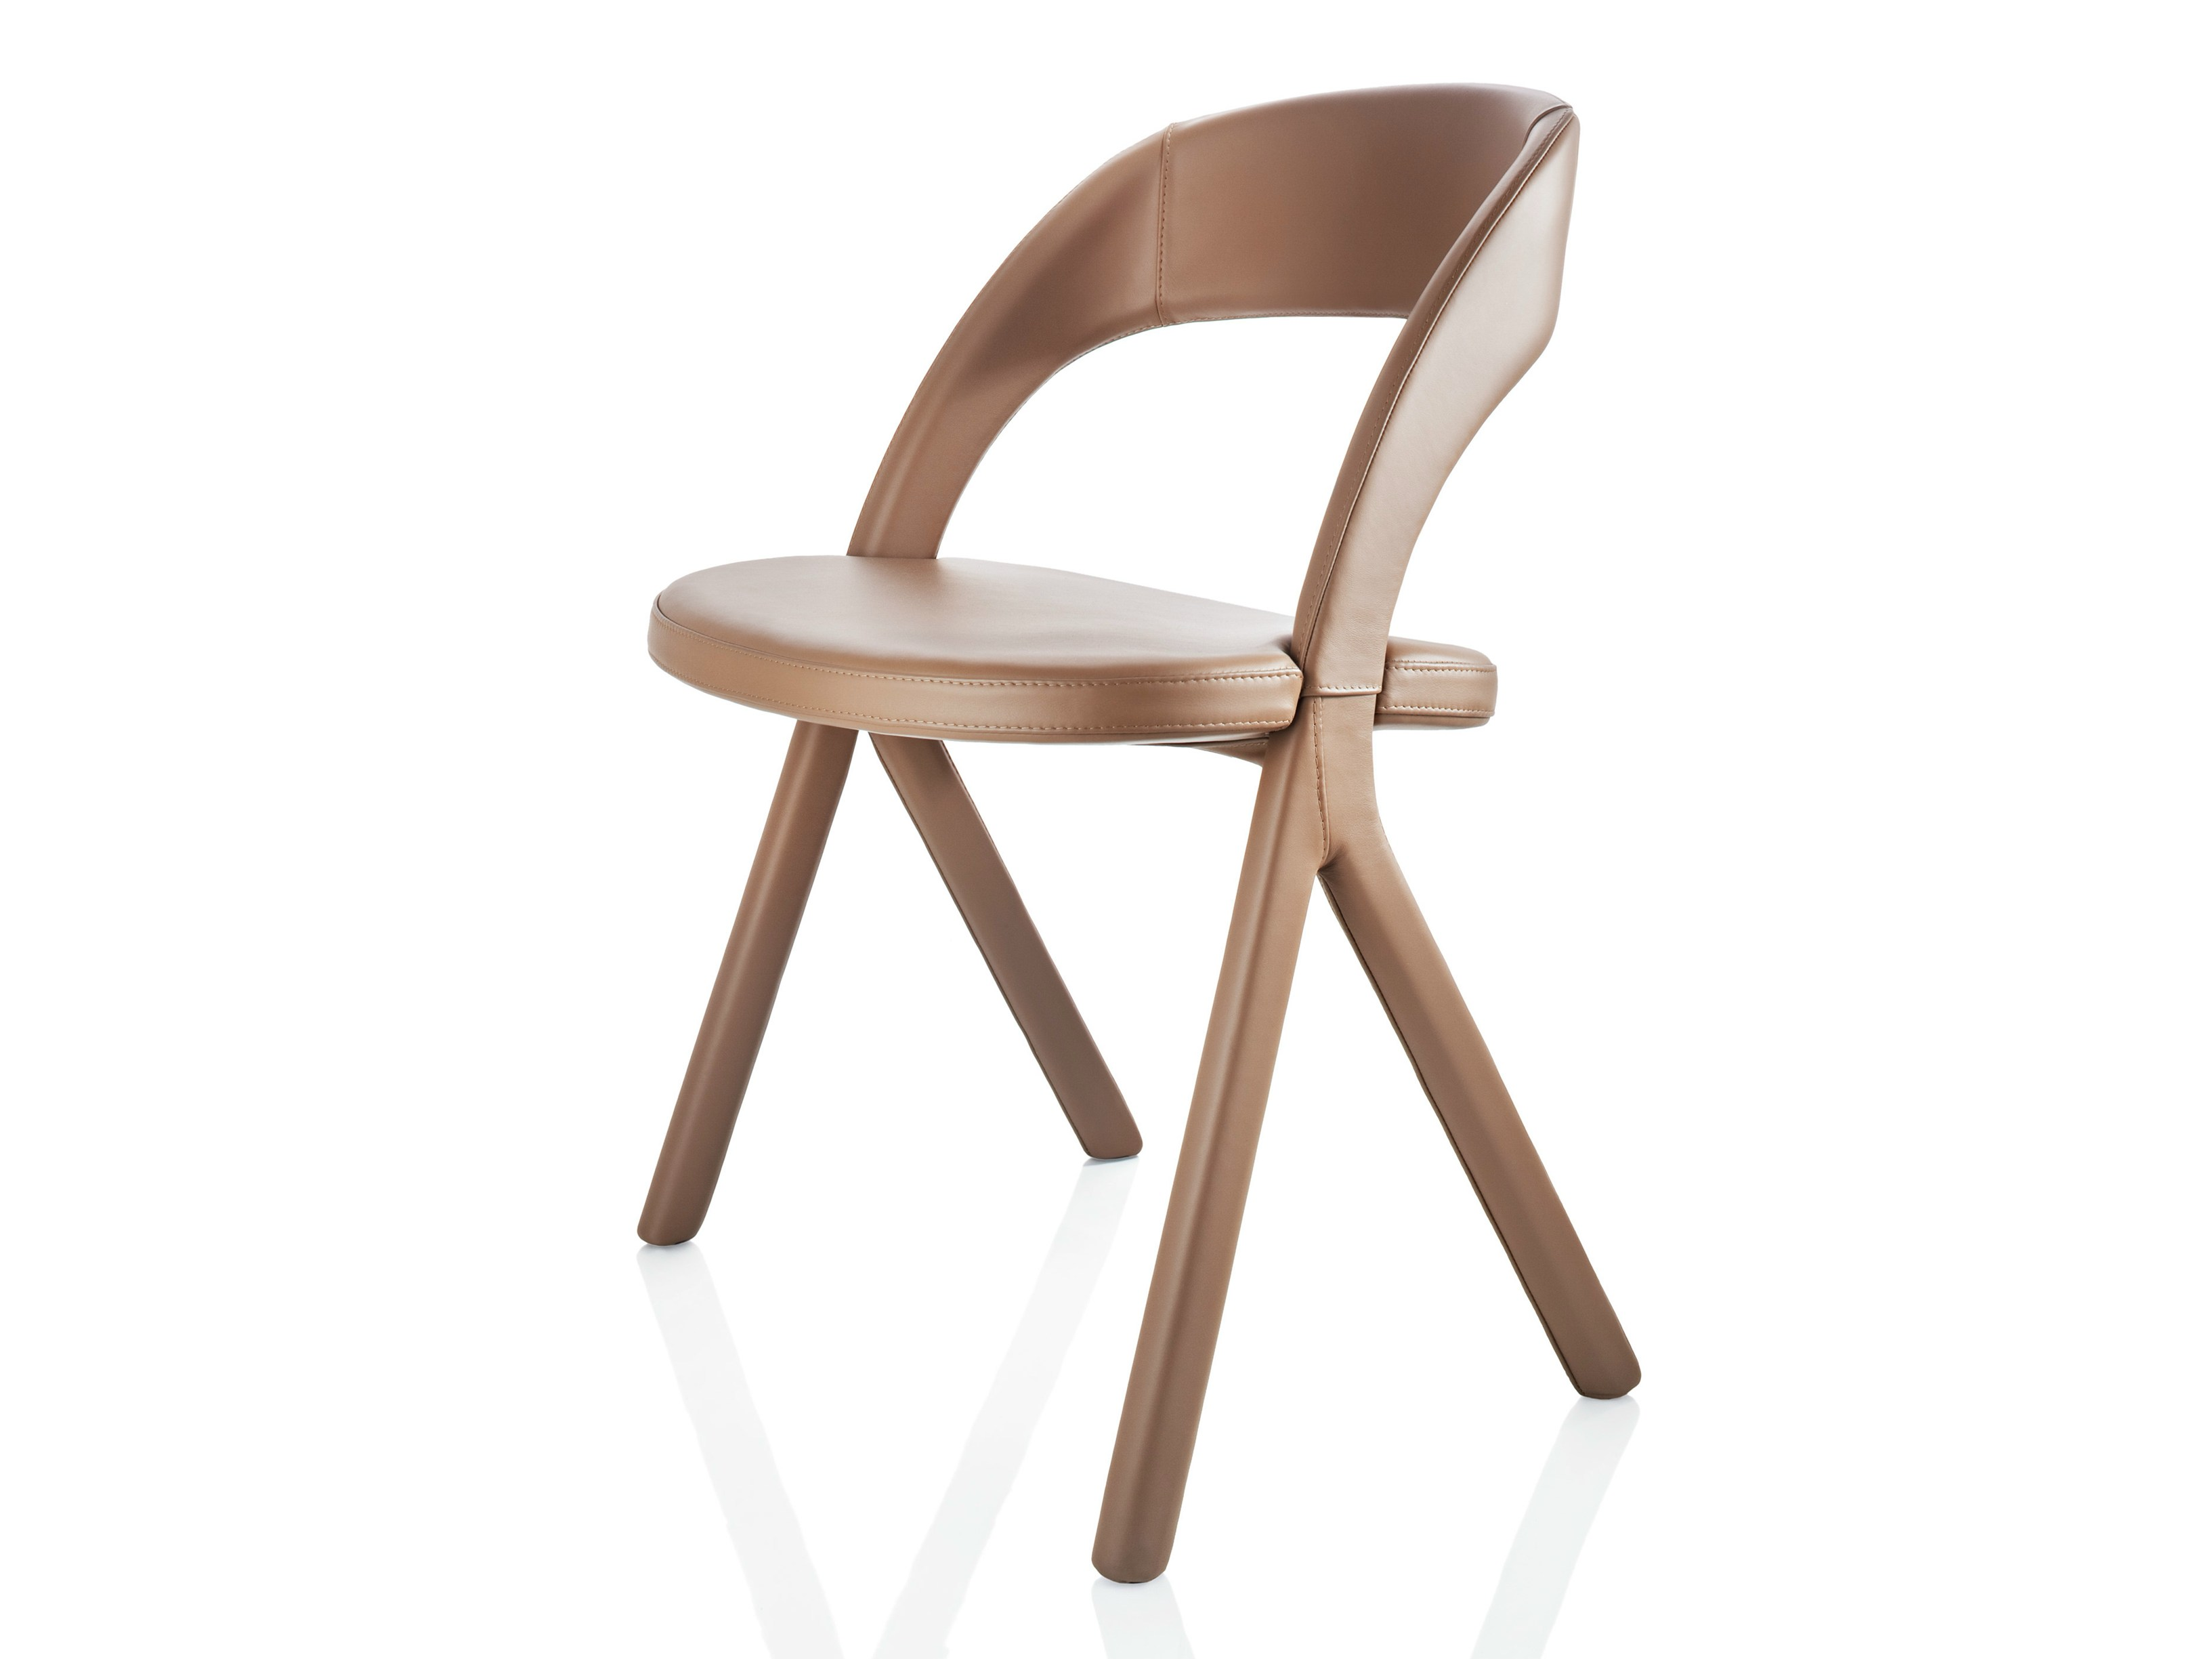 Gesto chaise en cuir by alma design design mario mazzer - Chaise en cuir design ...